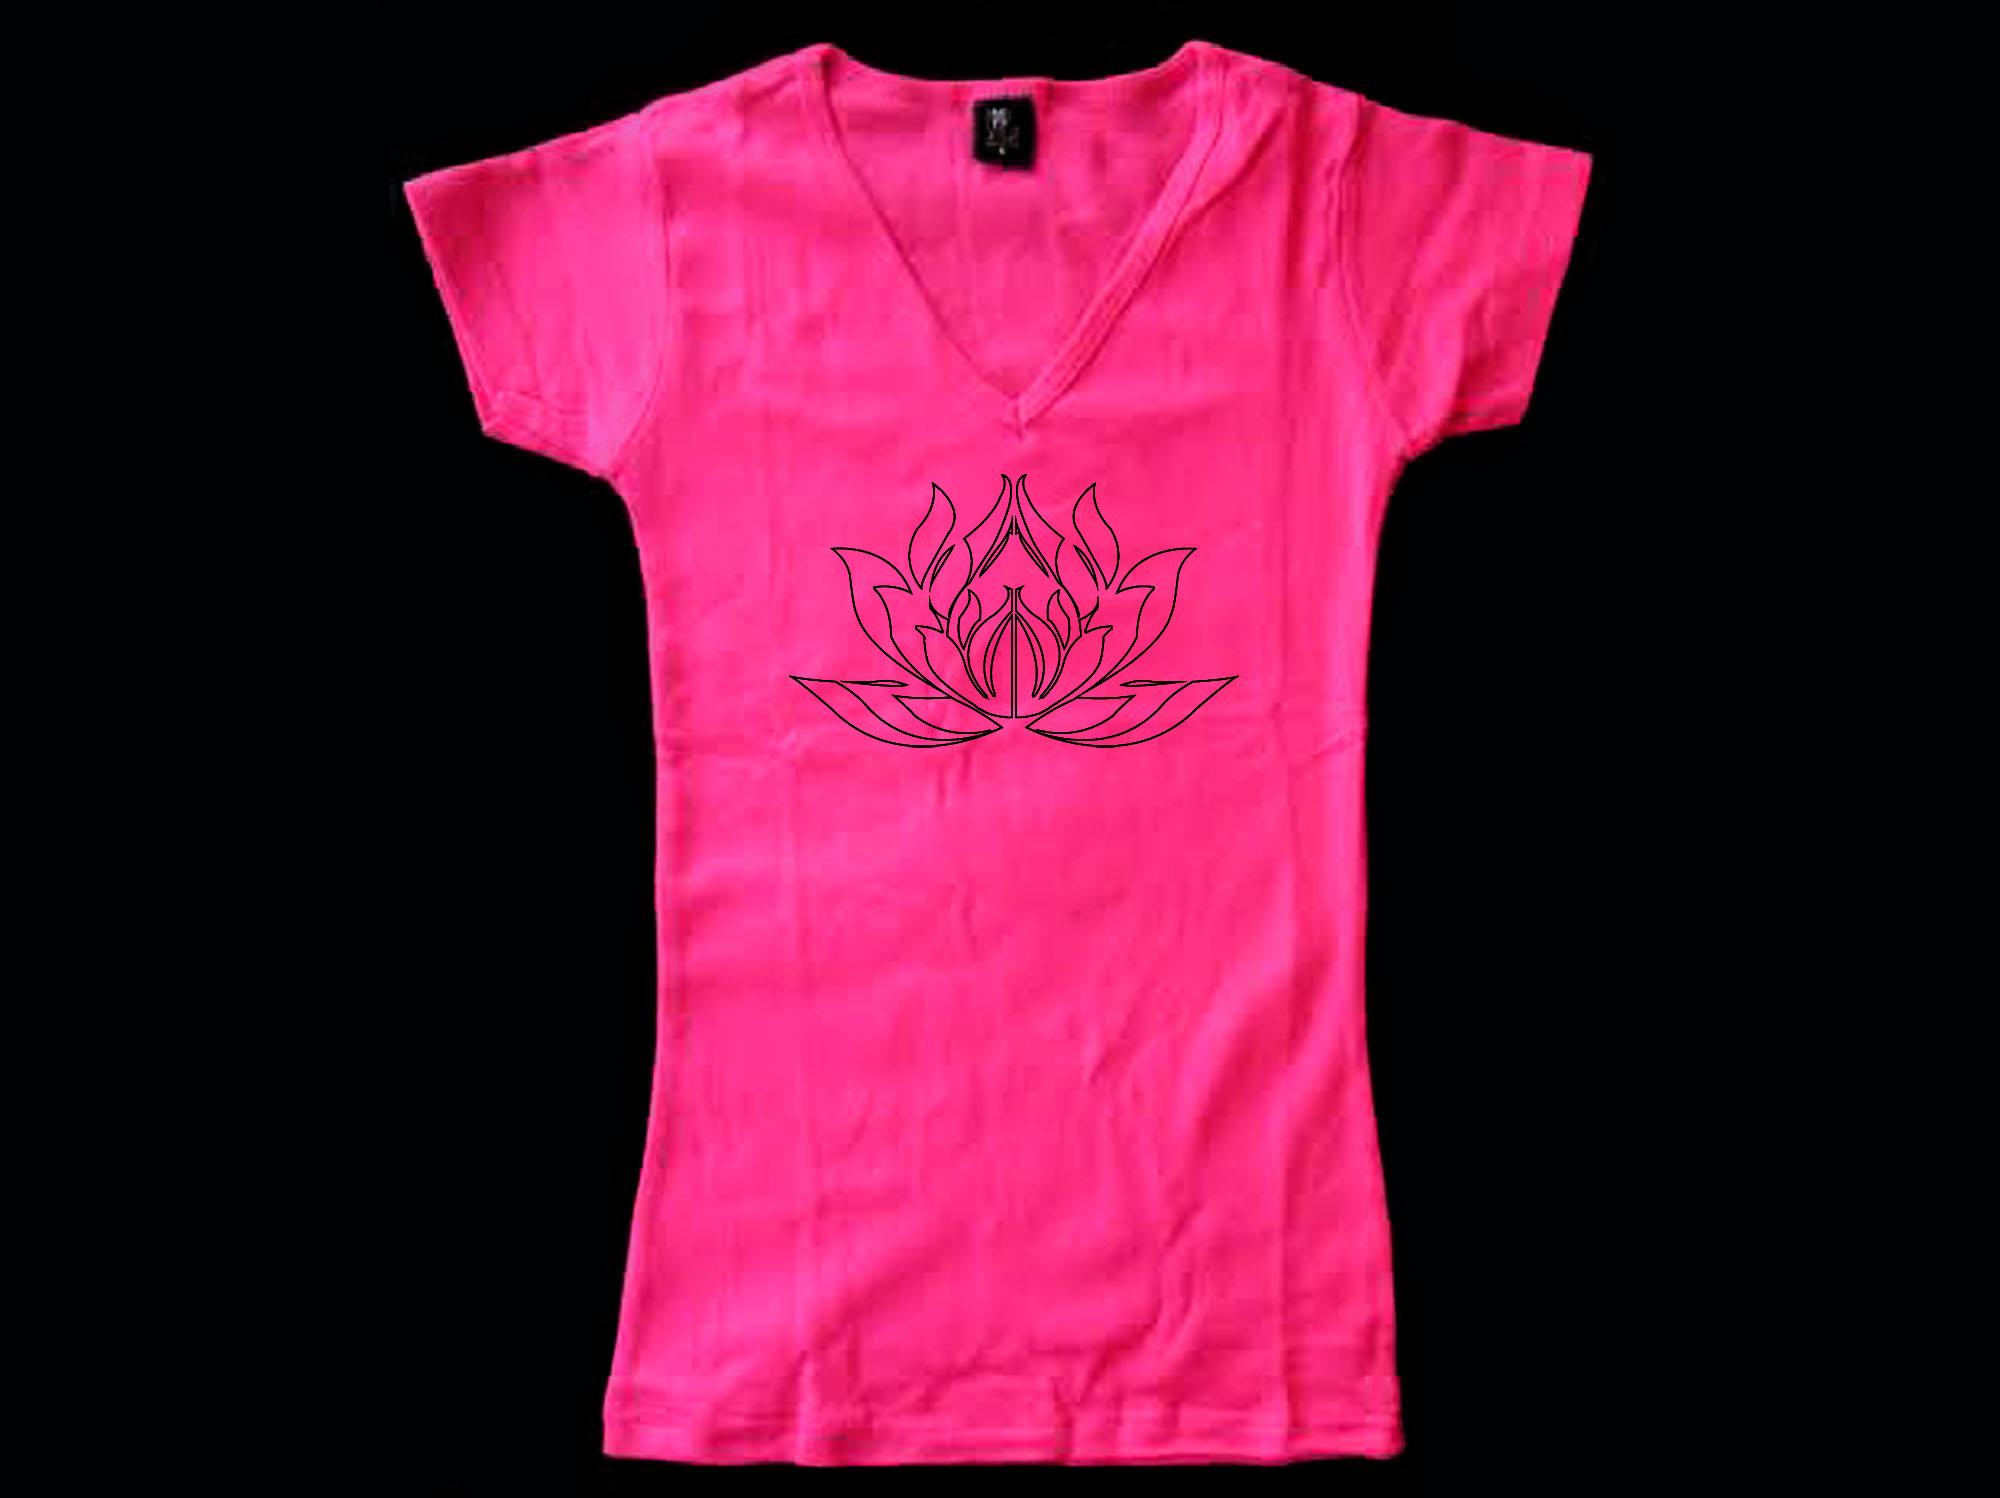 Oga Female T Shirts My Cool T Shirt Lotus Flower T Shirt Yoga